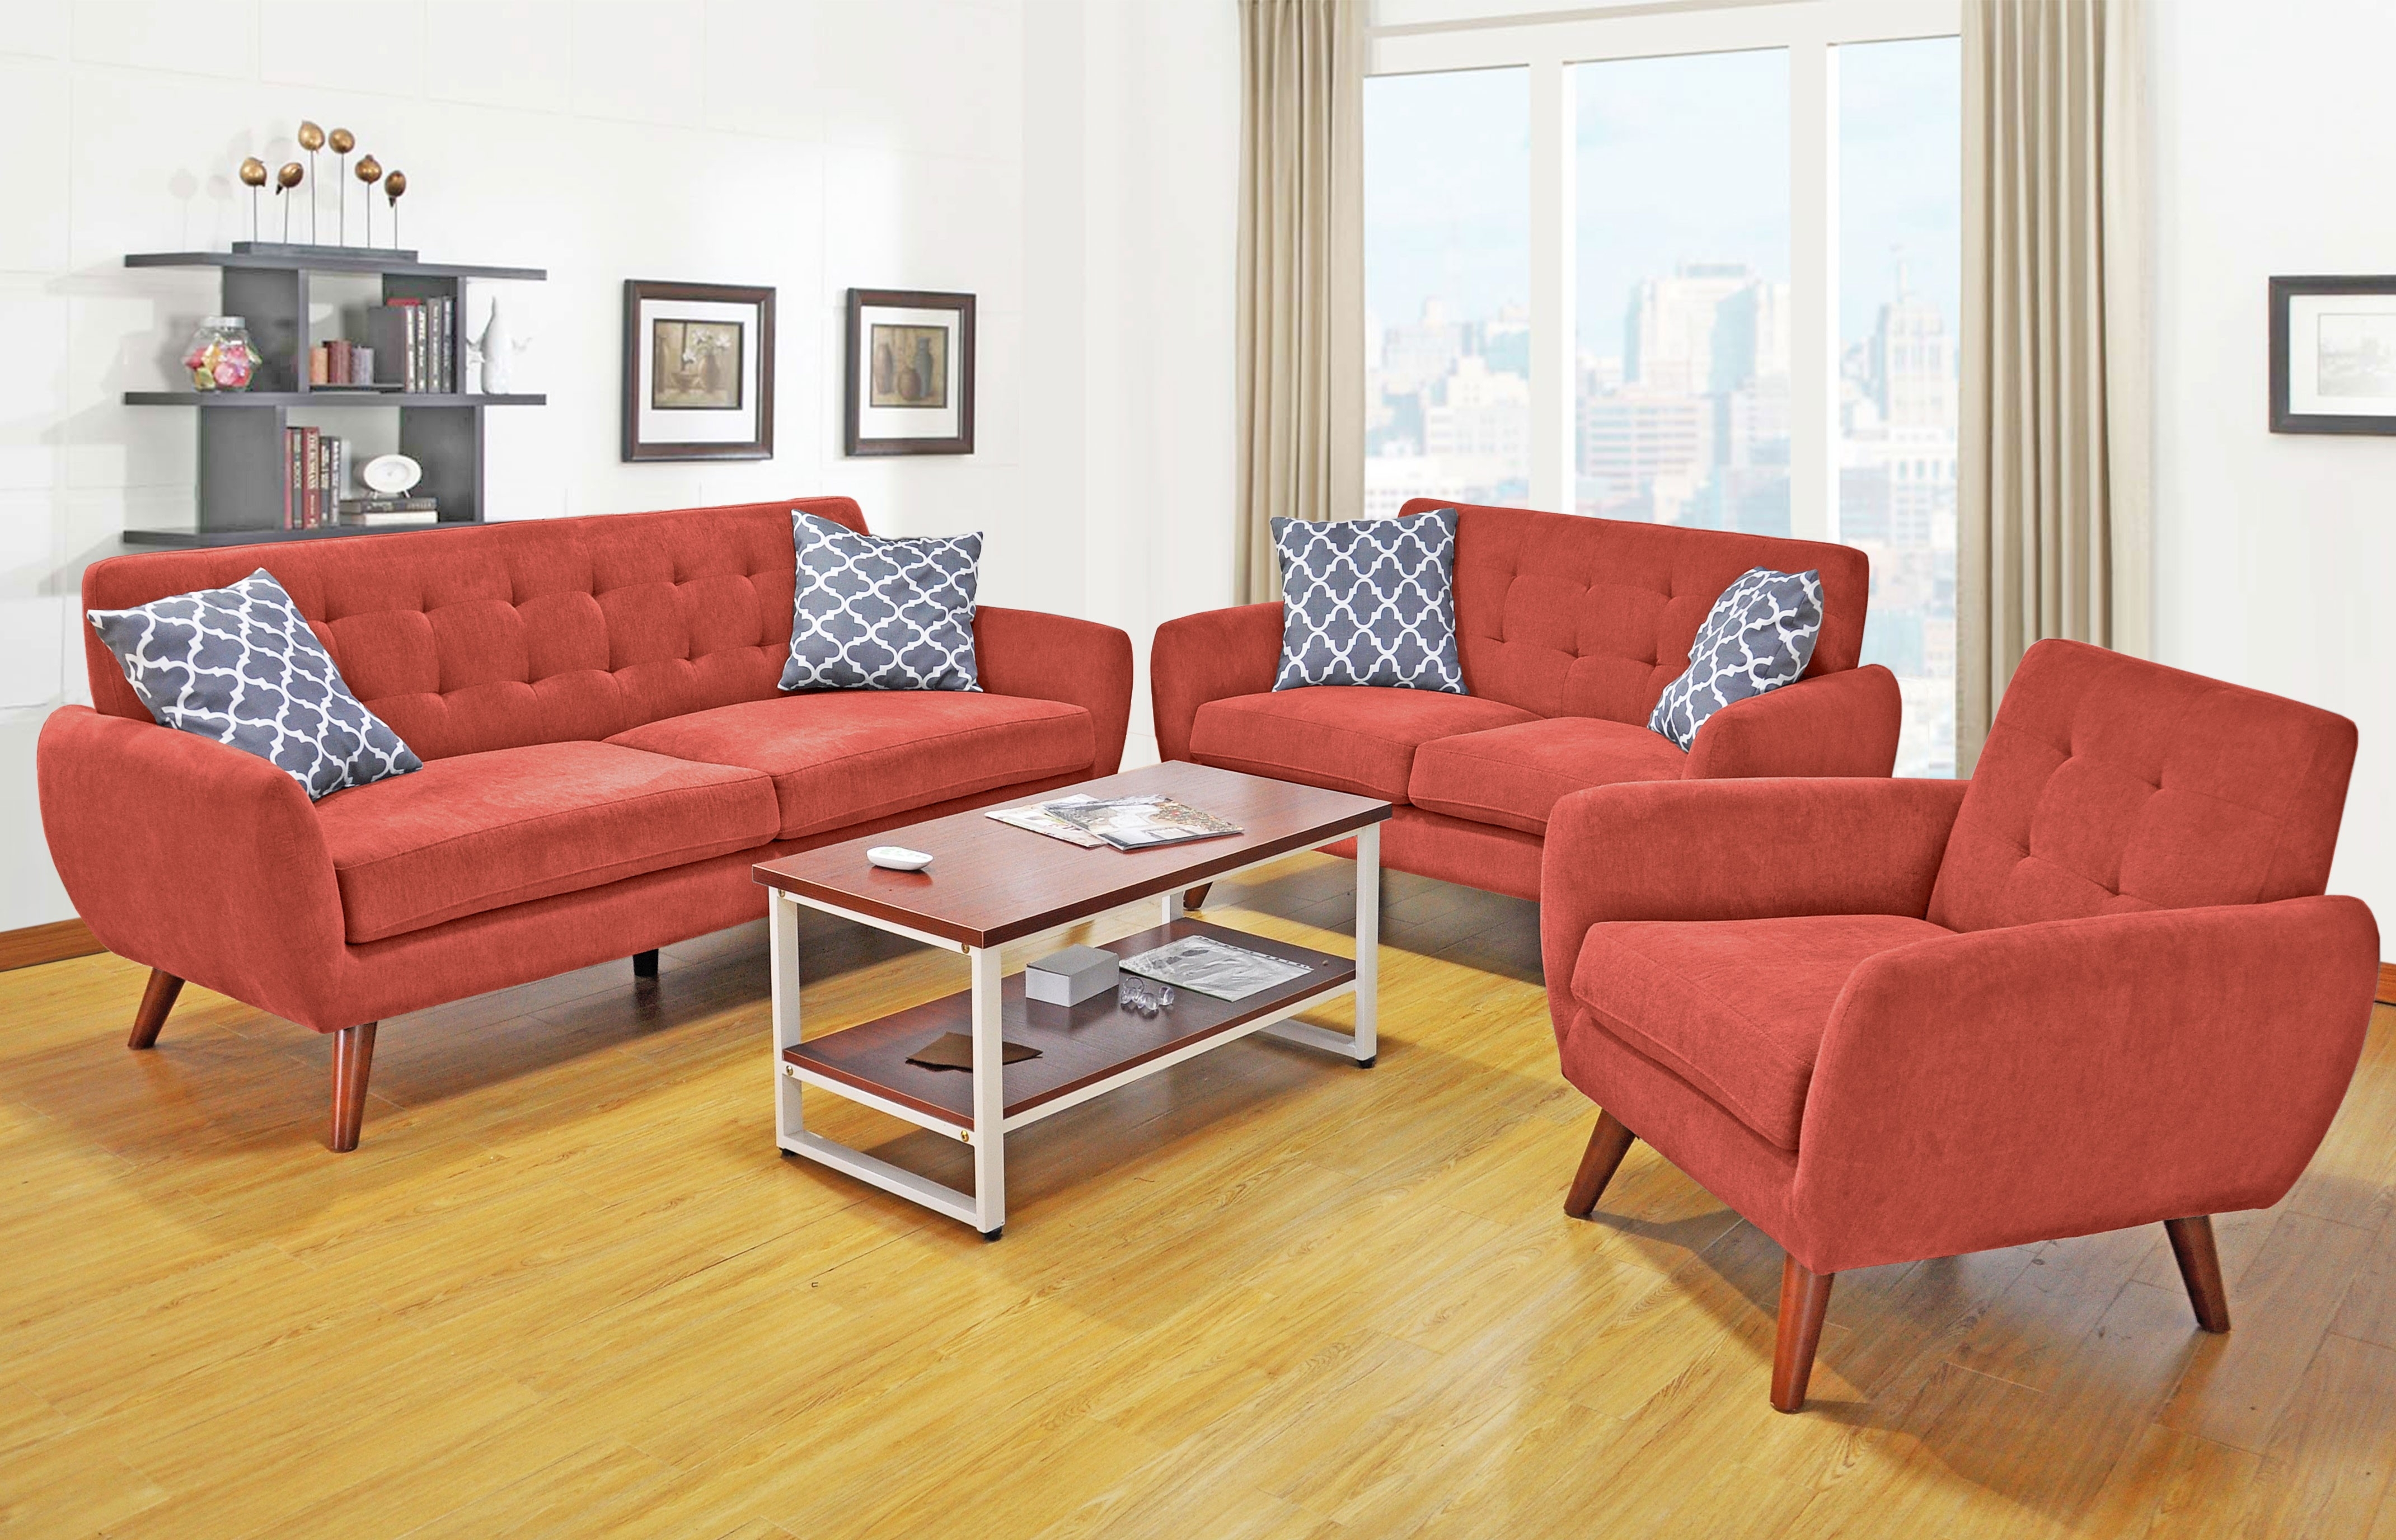 Mid Century Modern Sofa & Loveseat Living Room Set | Orange County in Orange County Sofas (Image 7 of 10)